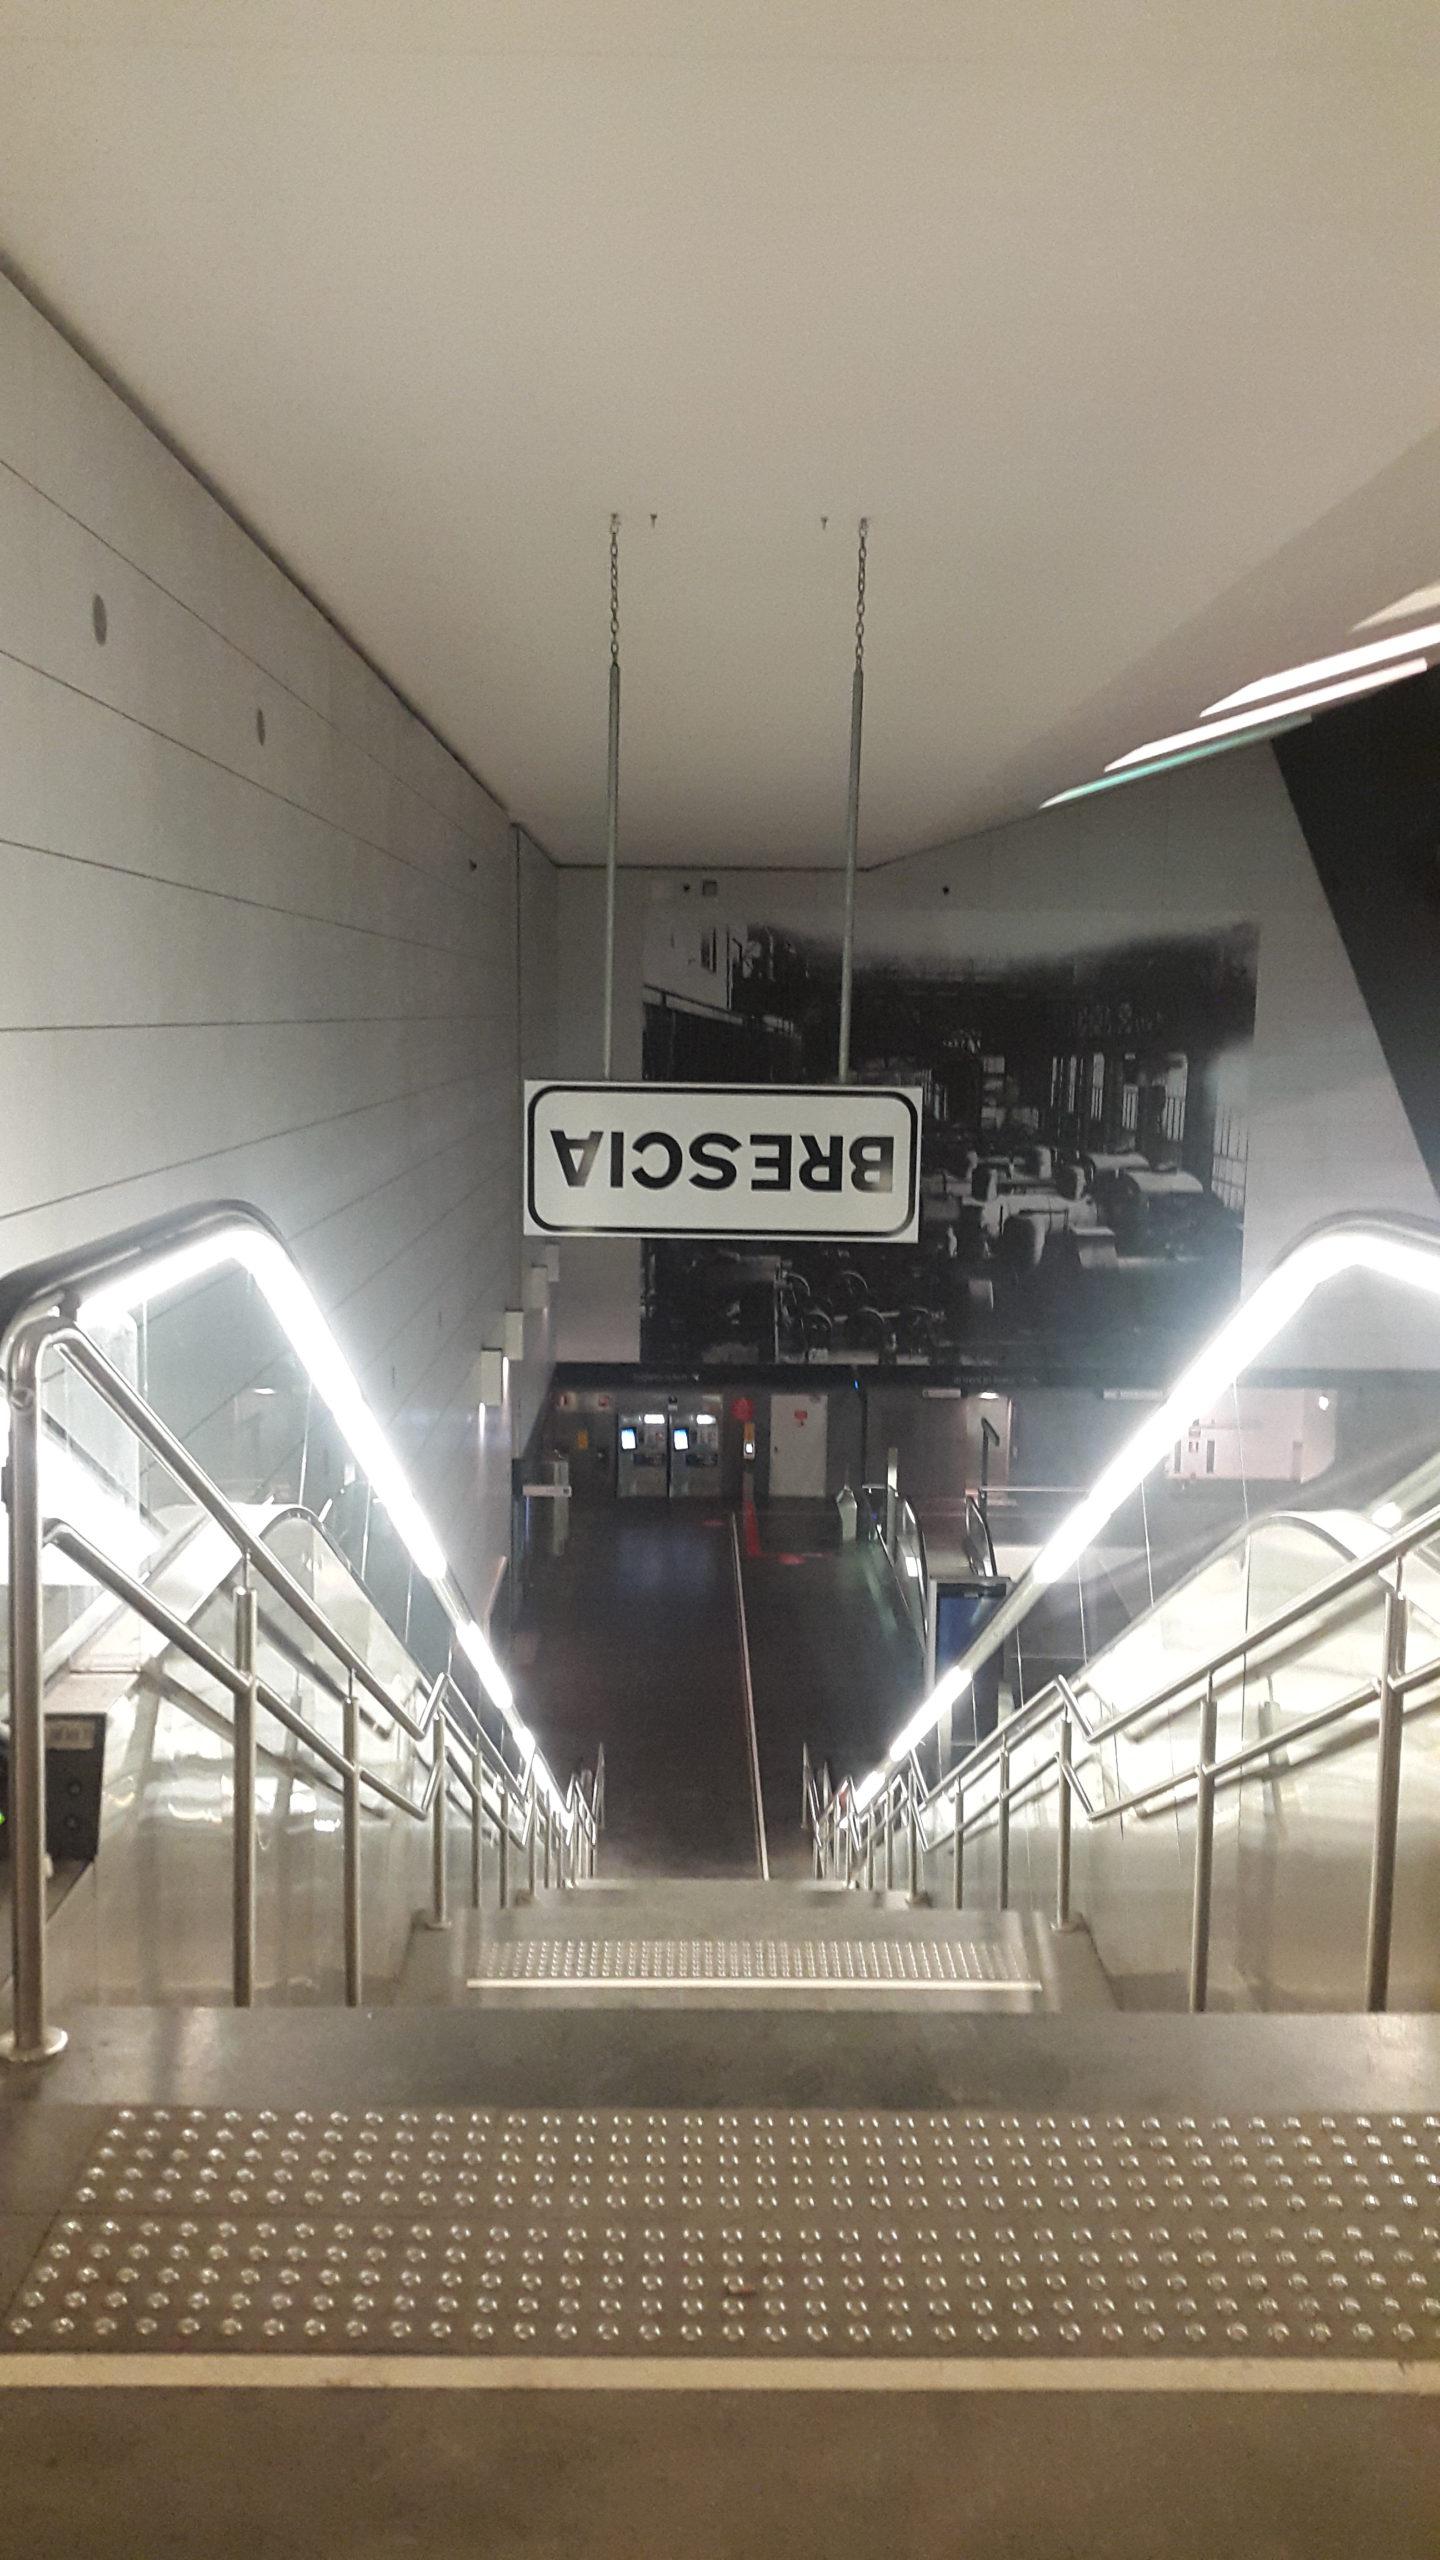 BRESCIA INFRASTRUTTURE Metro Brescia